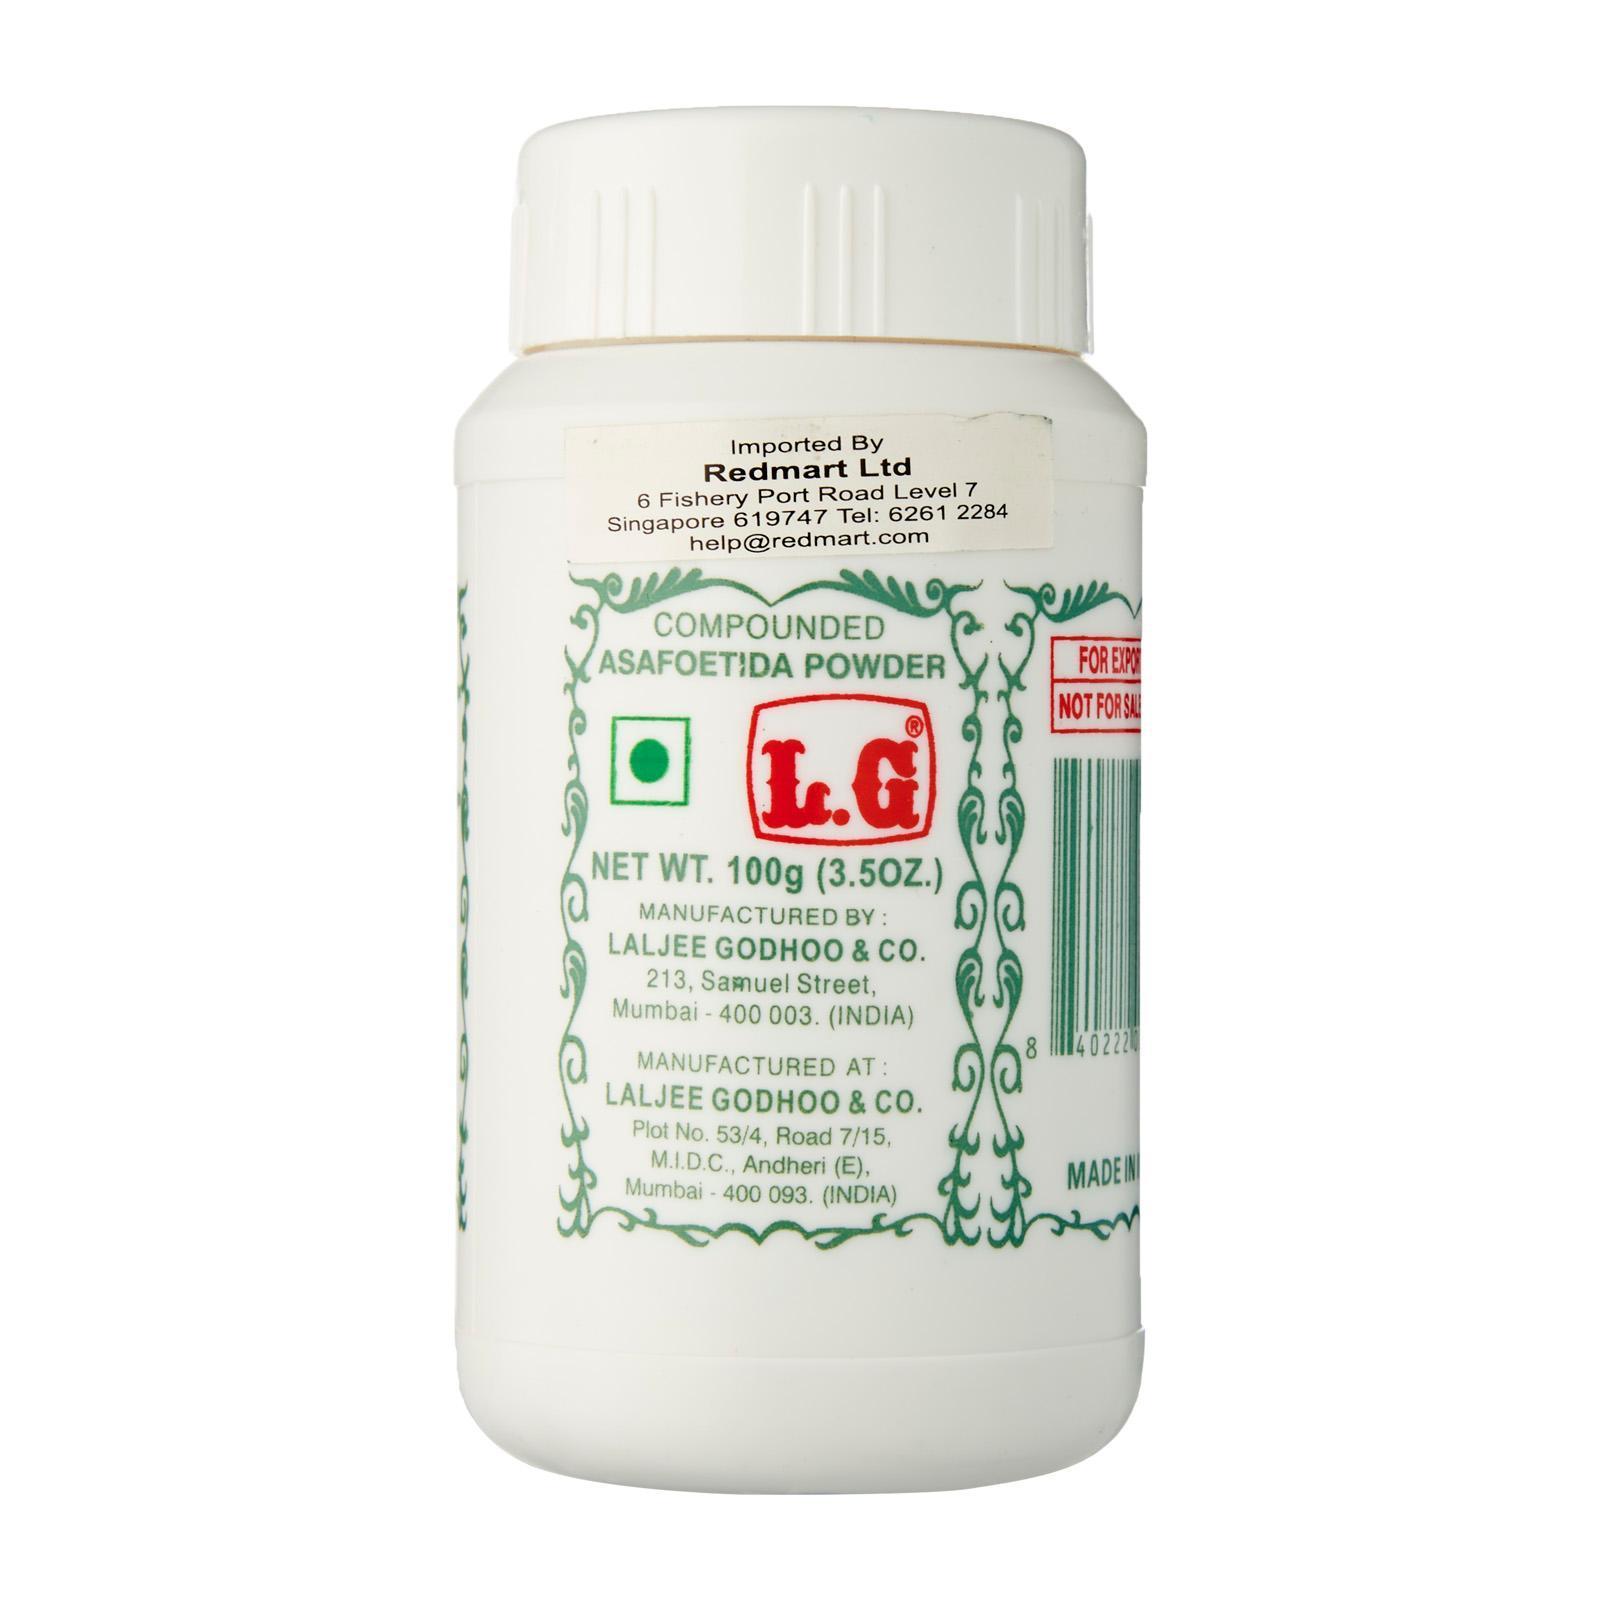 LG Hing Powder